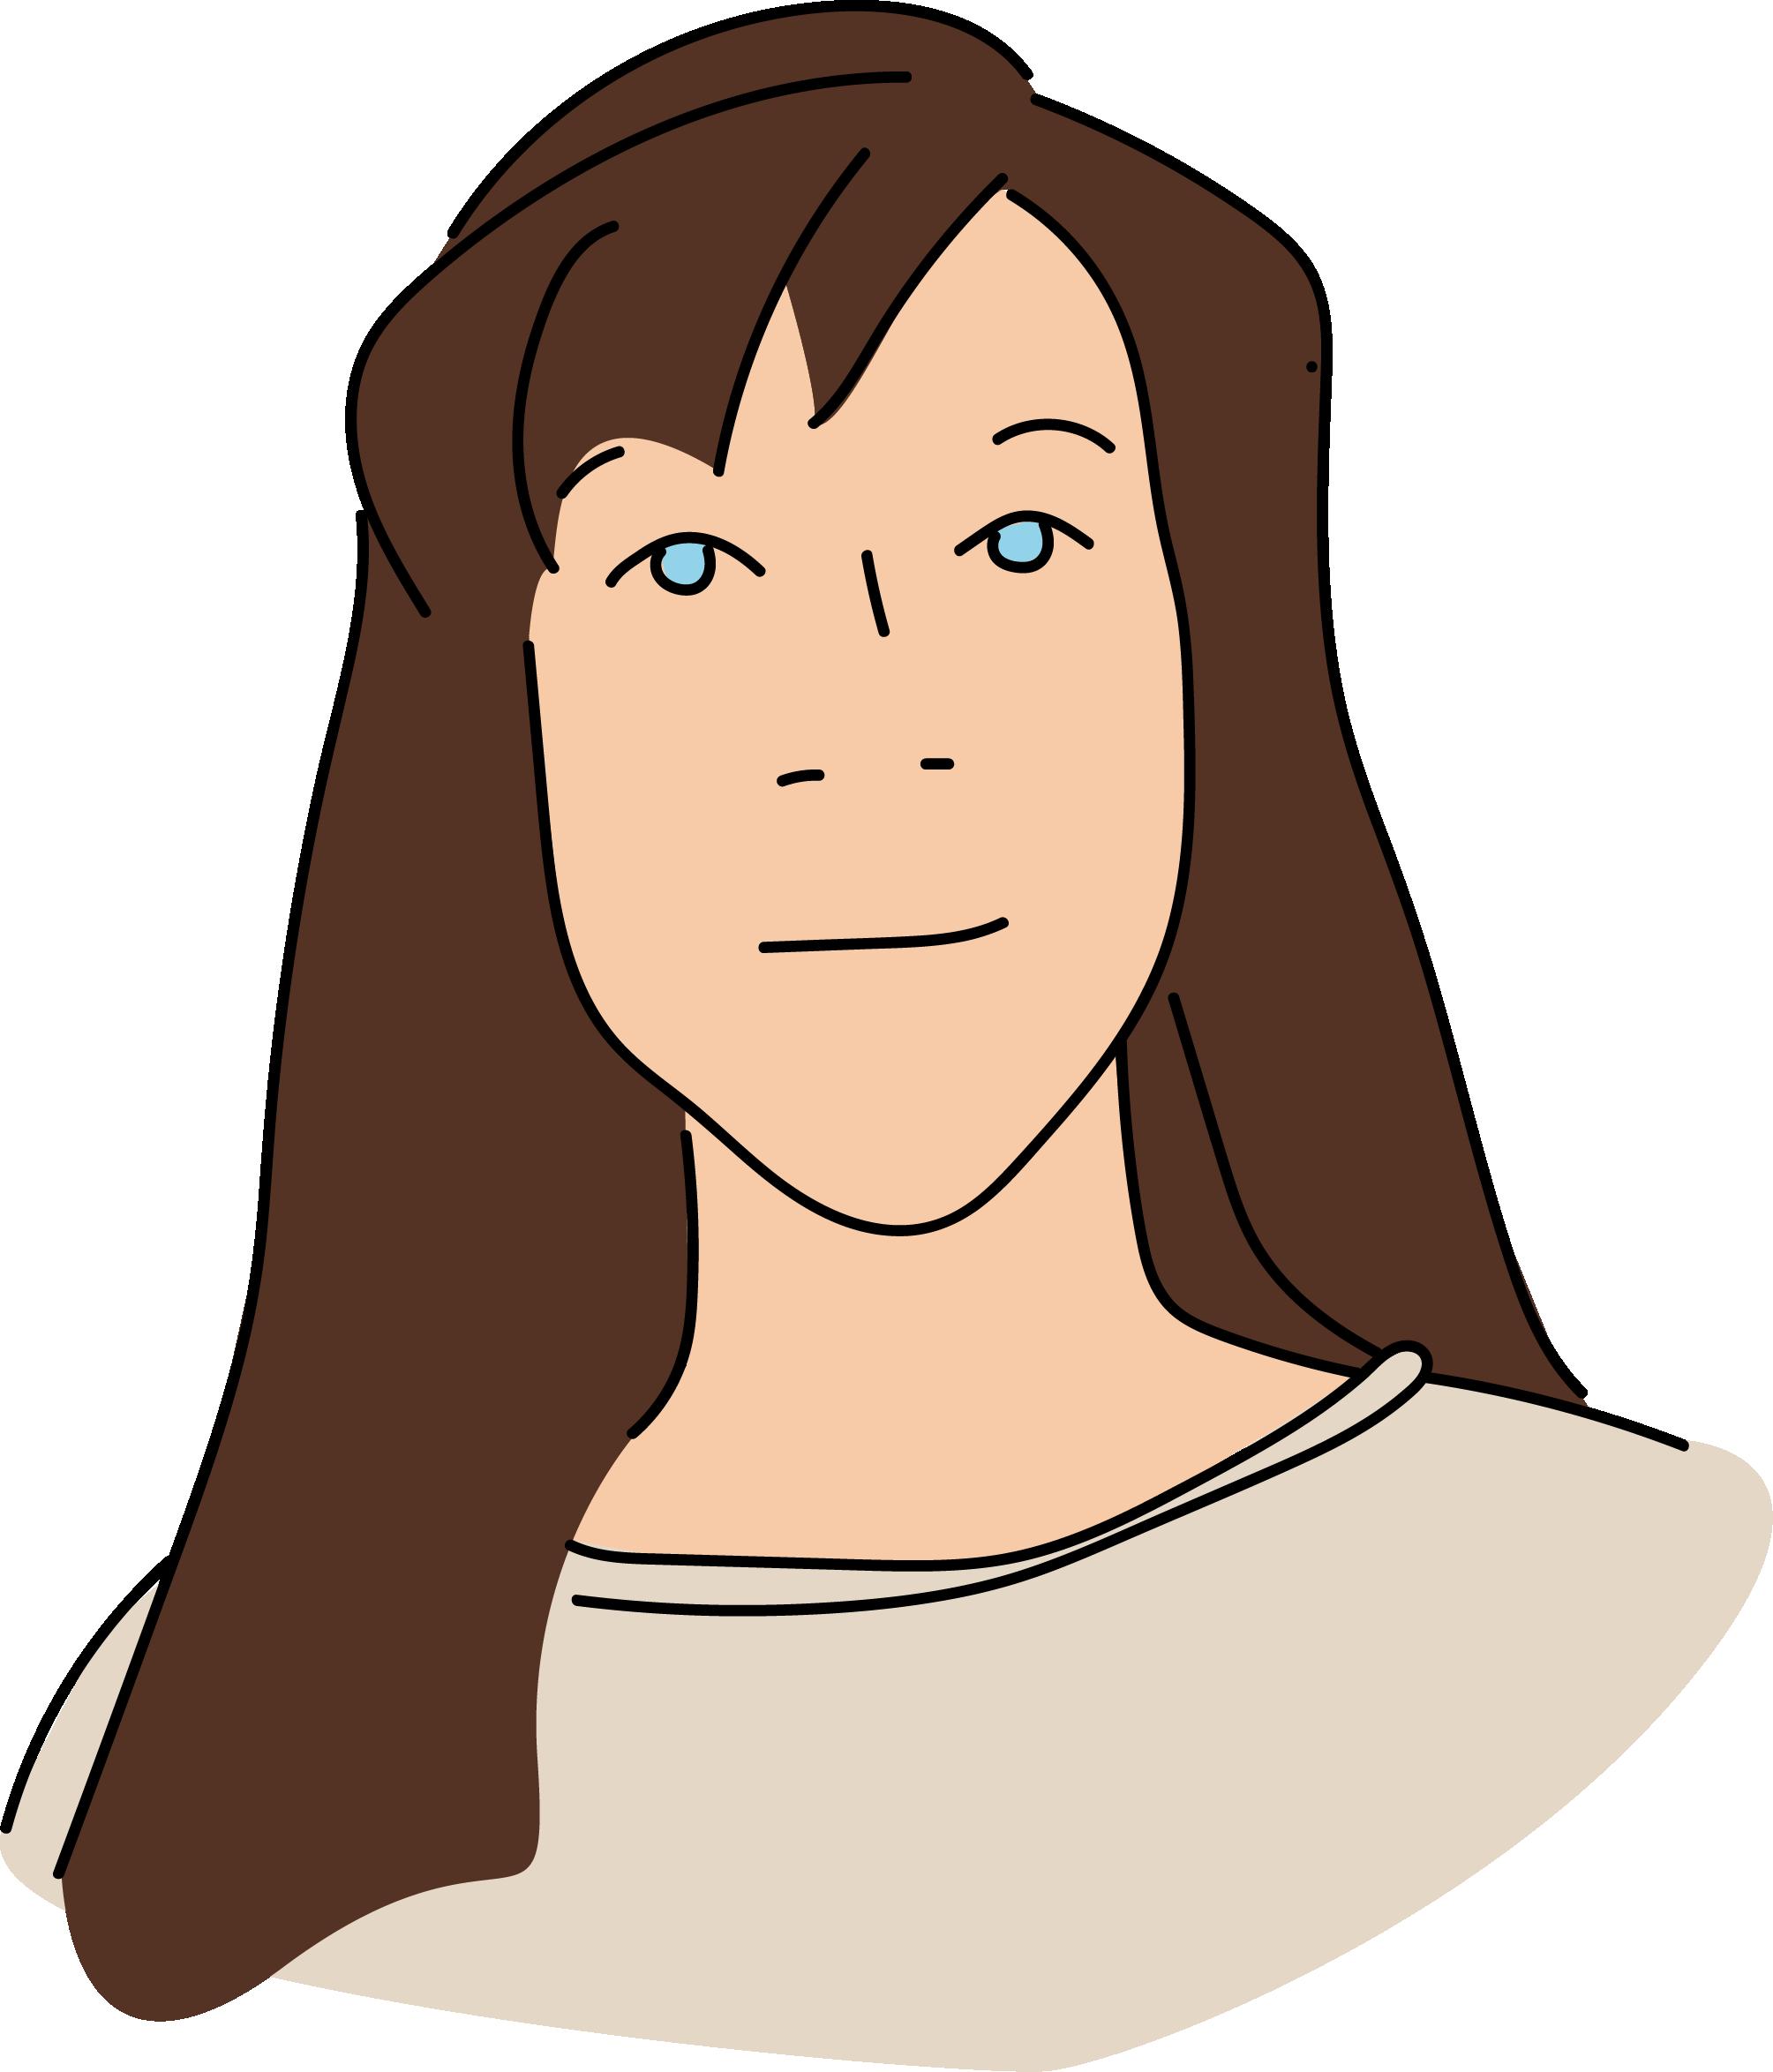 Kelly Ann Pidgeon